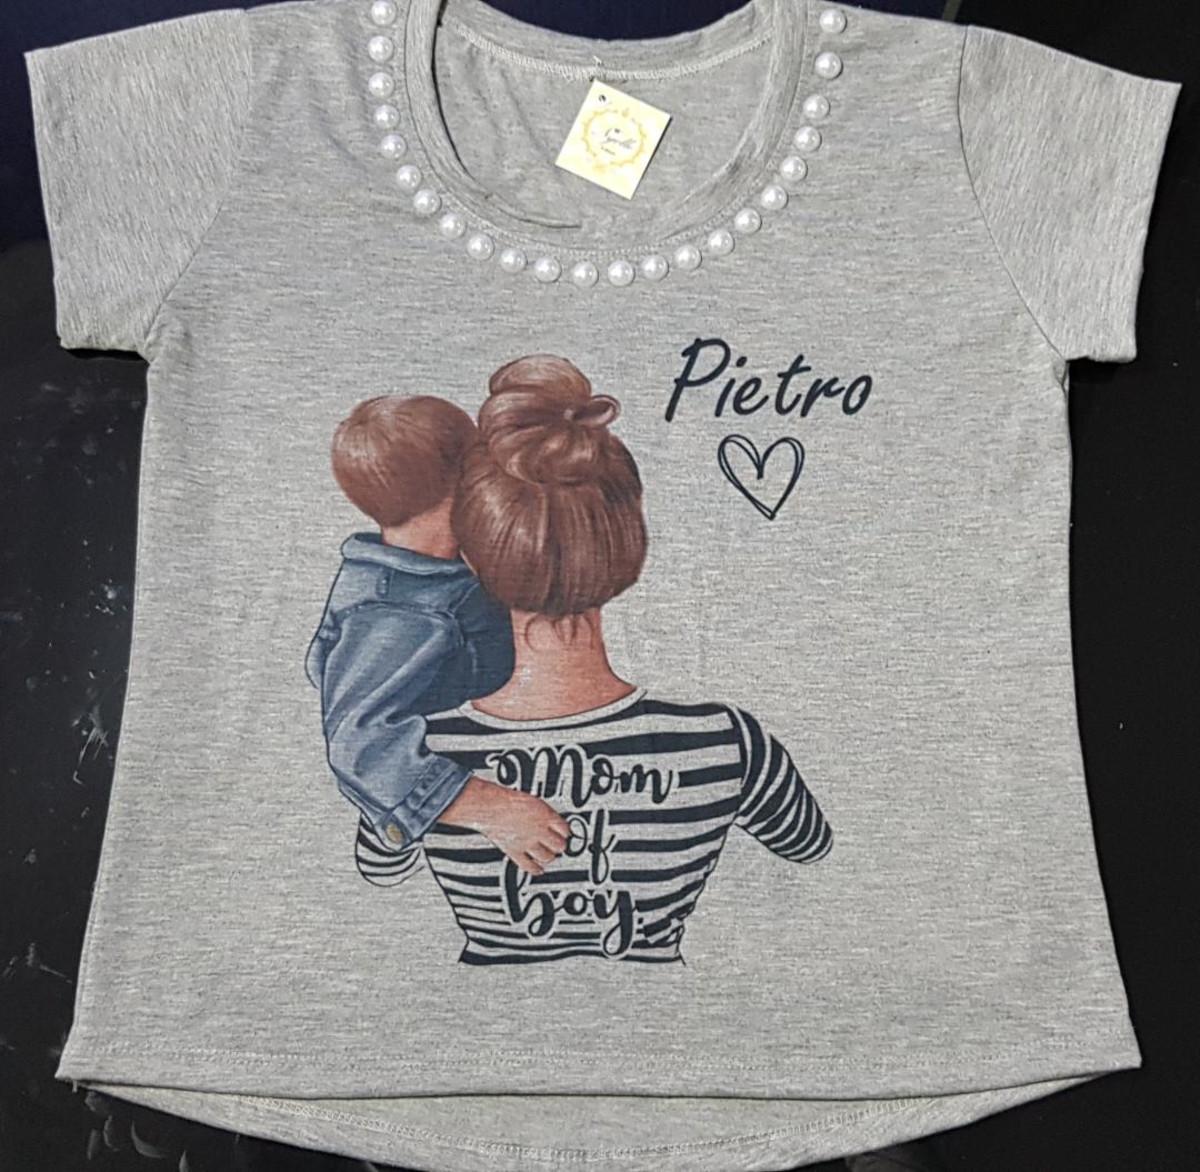 342680362 Camiseta Feminina - Mãe de 1 menino personalizada no Elo7   Nyelle T ...